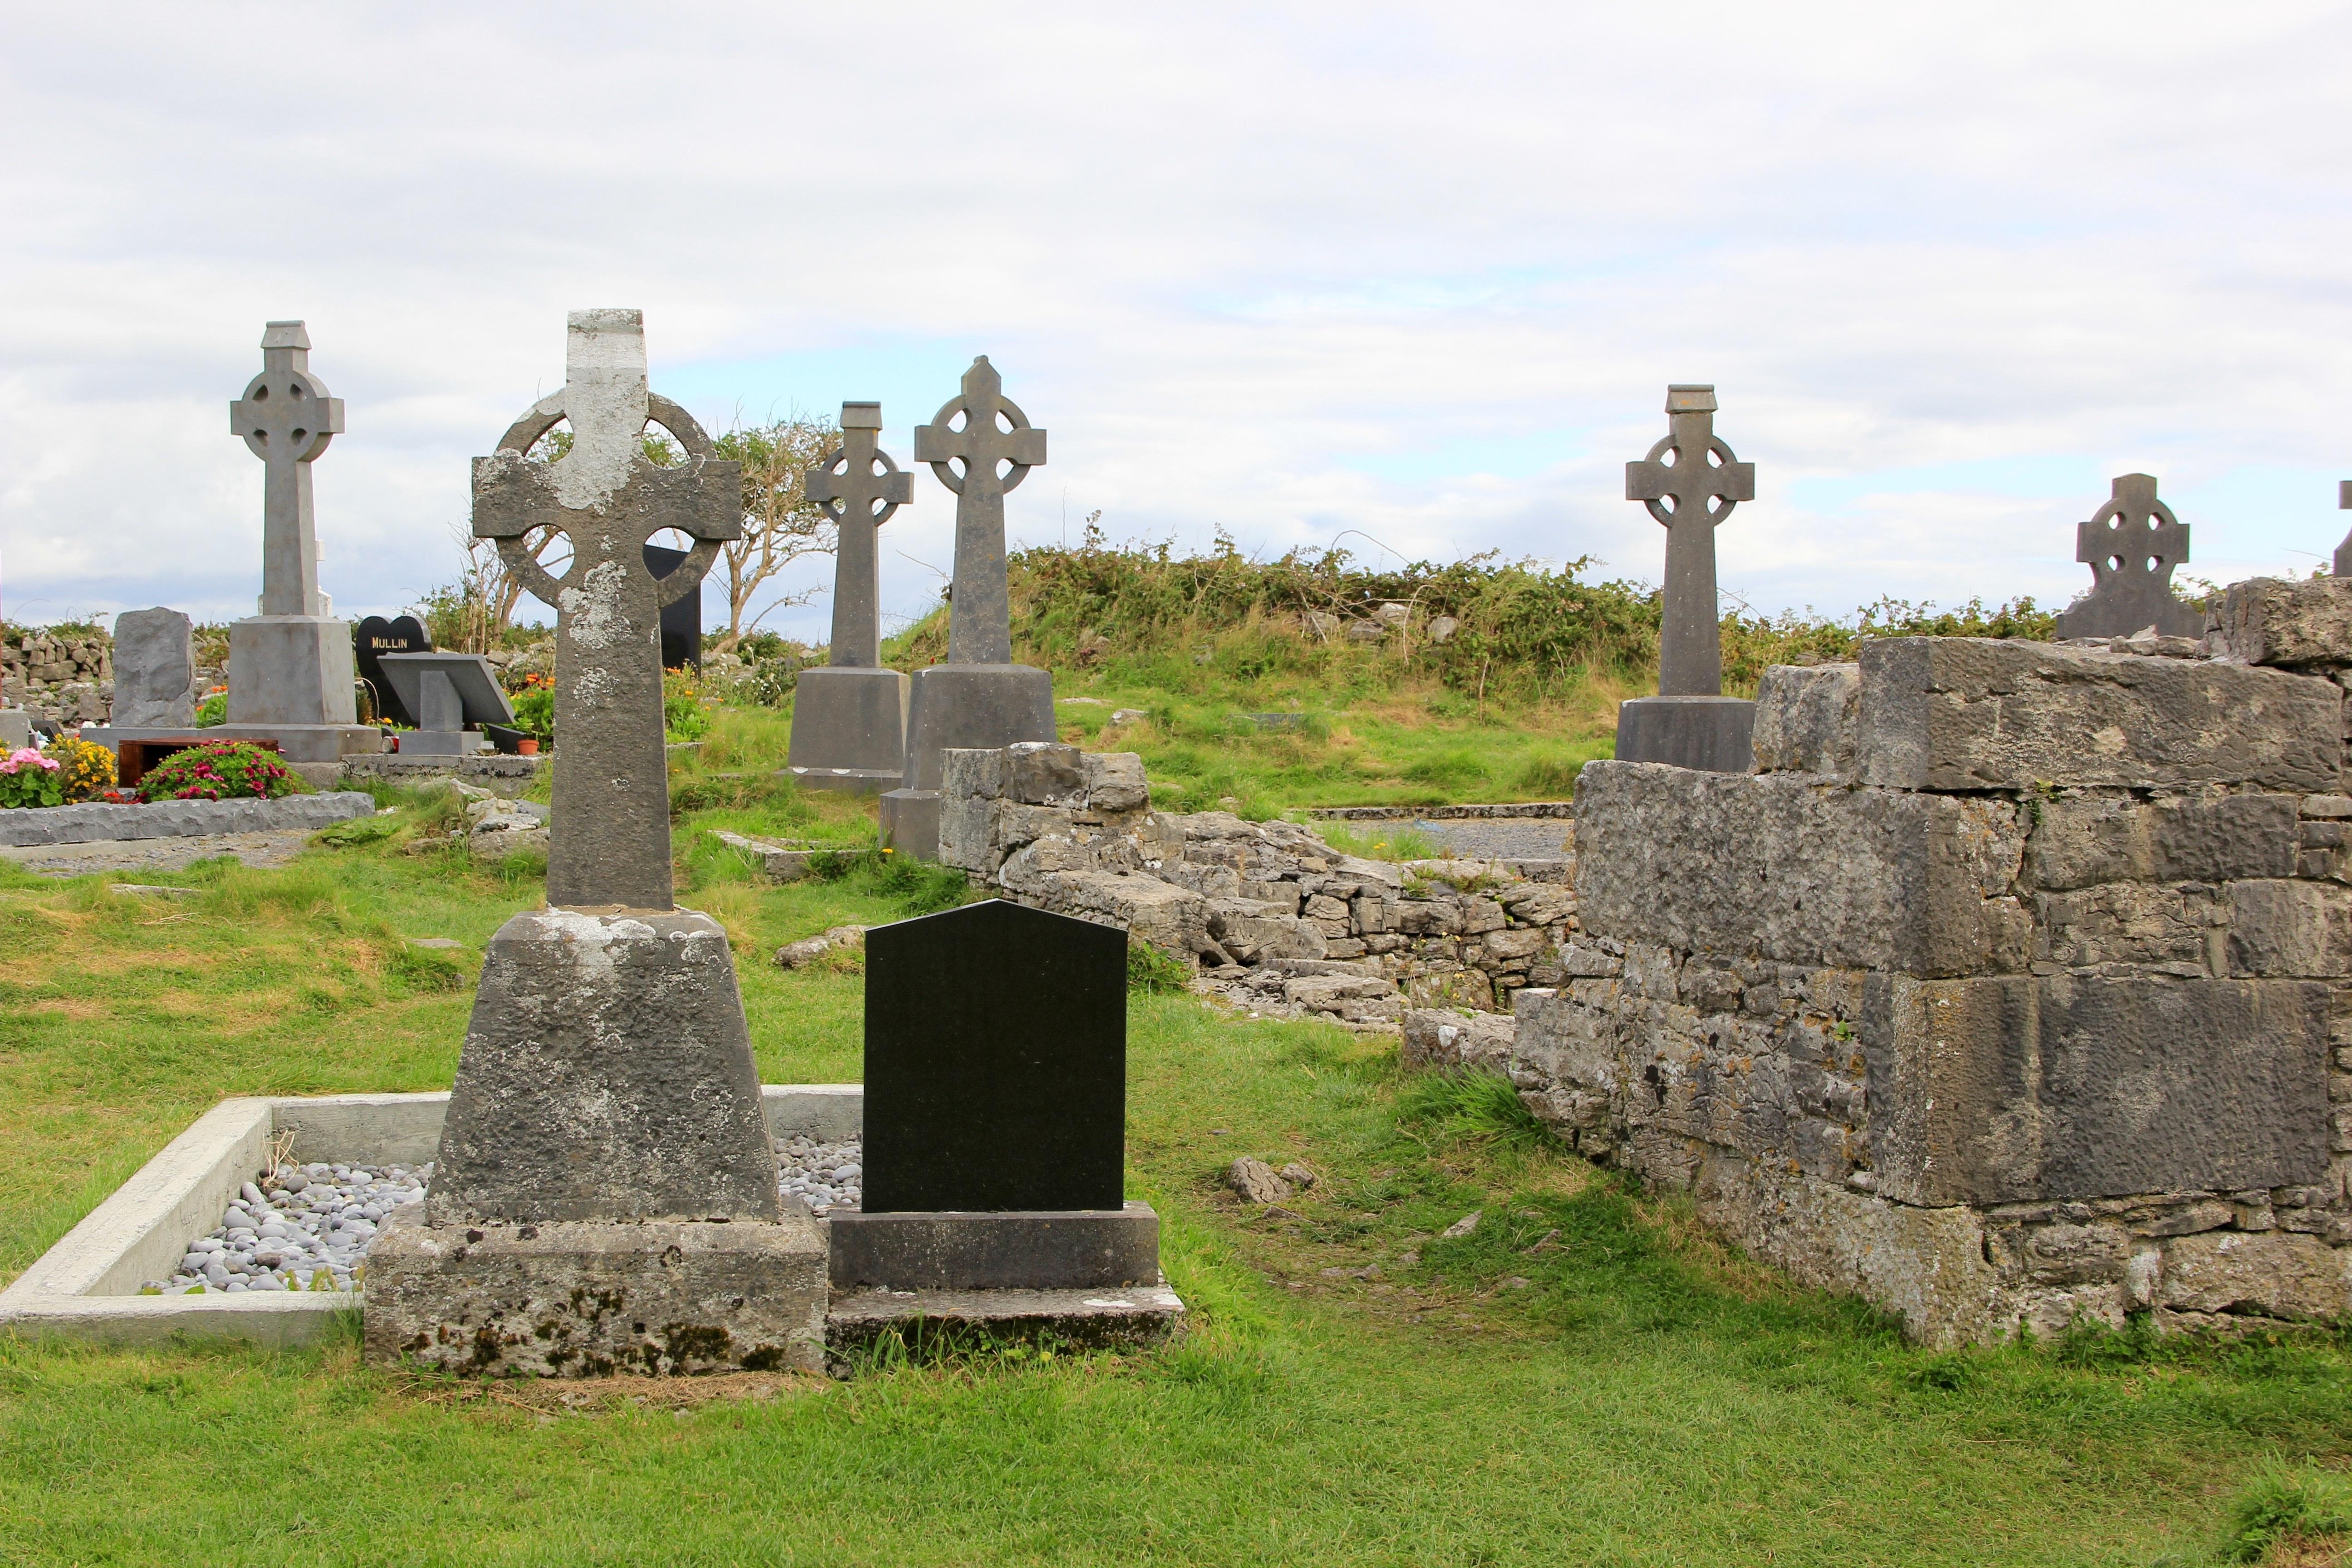 Httpsgetpxherecomphotomonumentreligioncro - Celtic religion